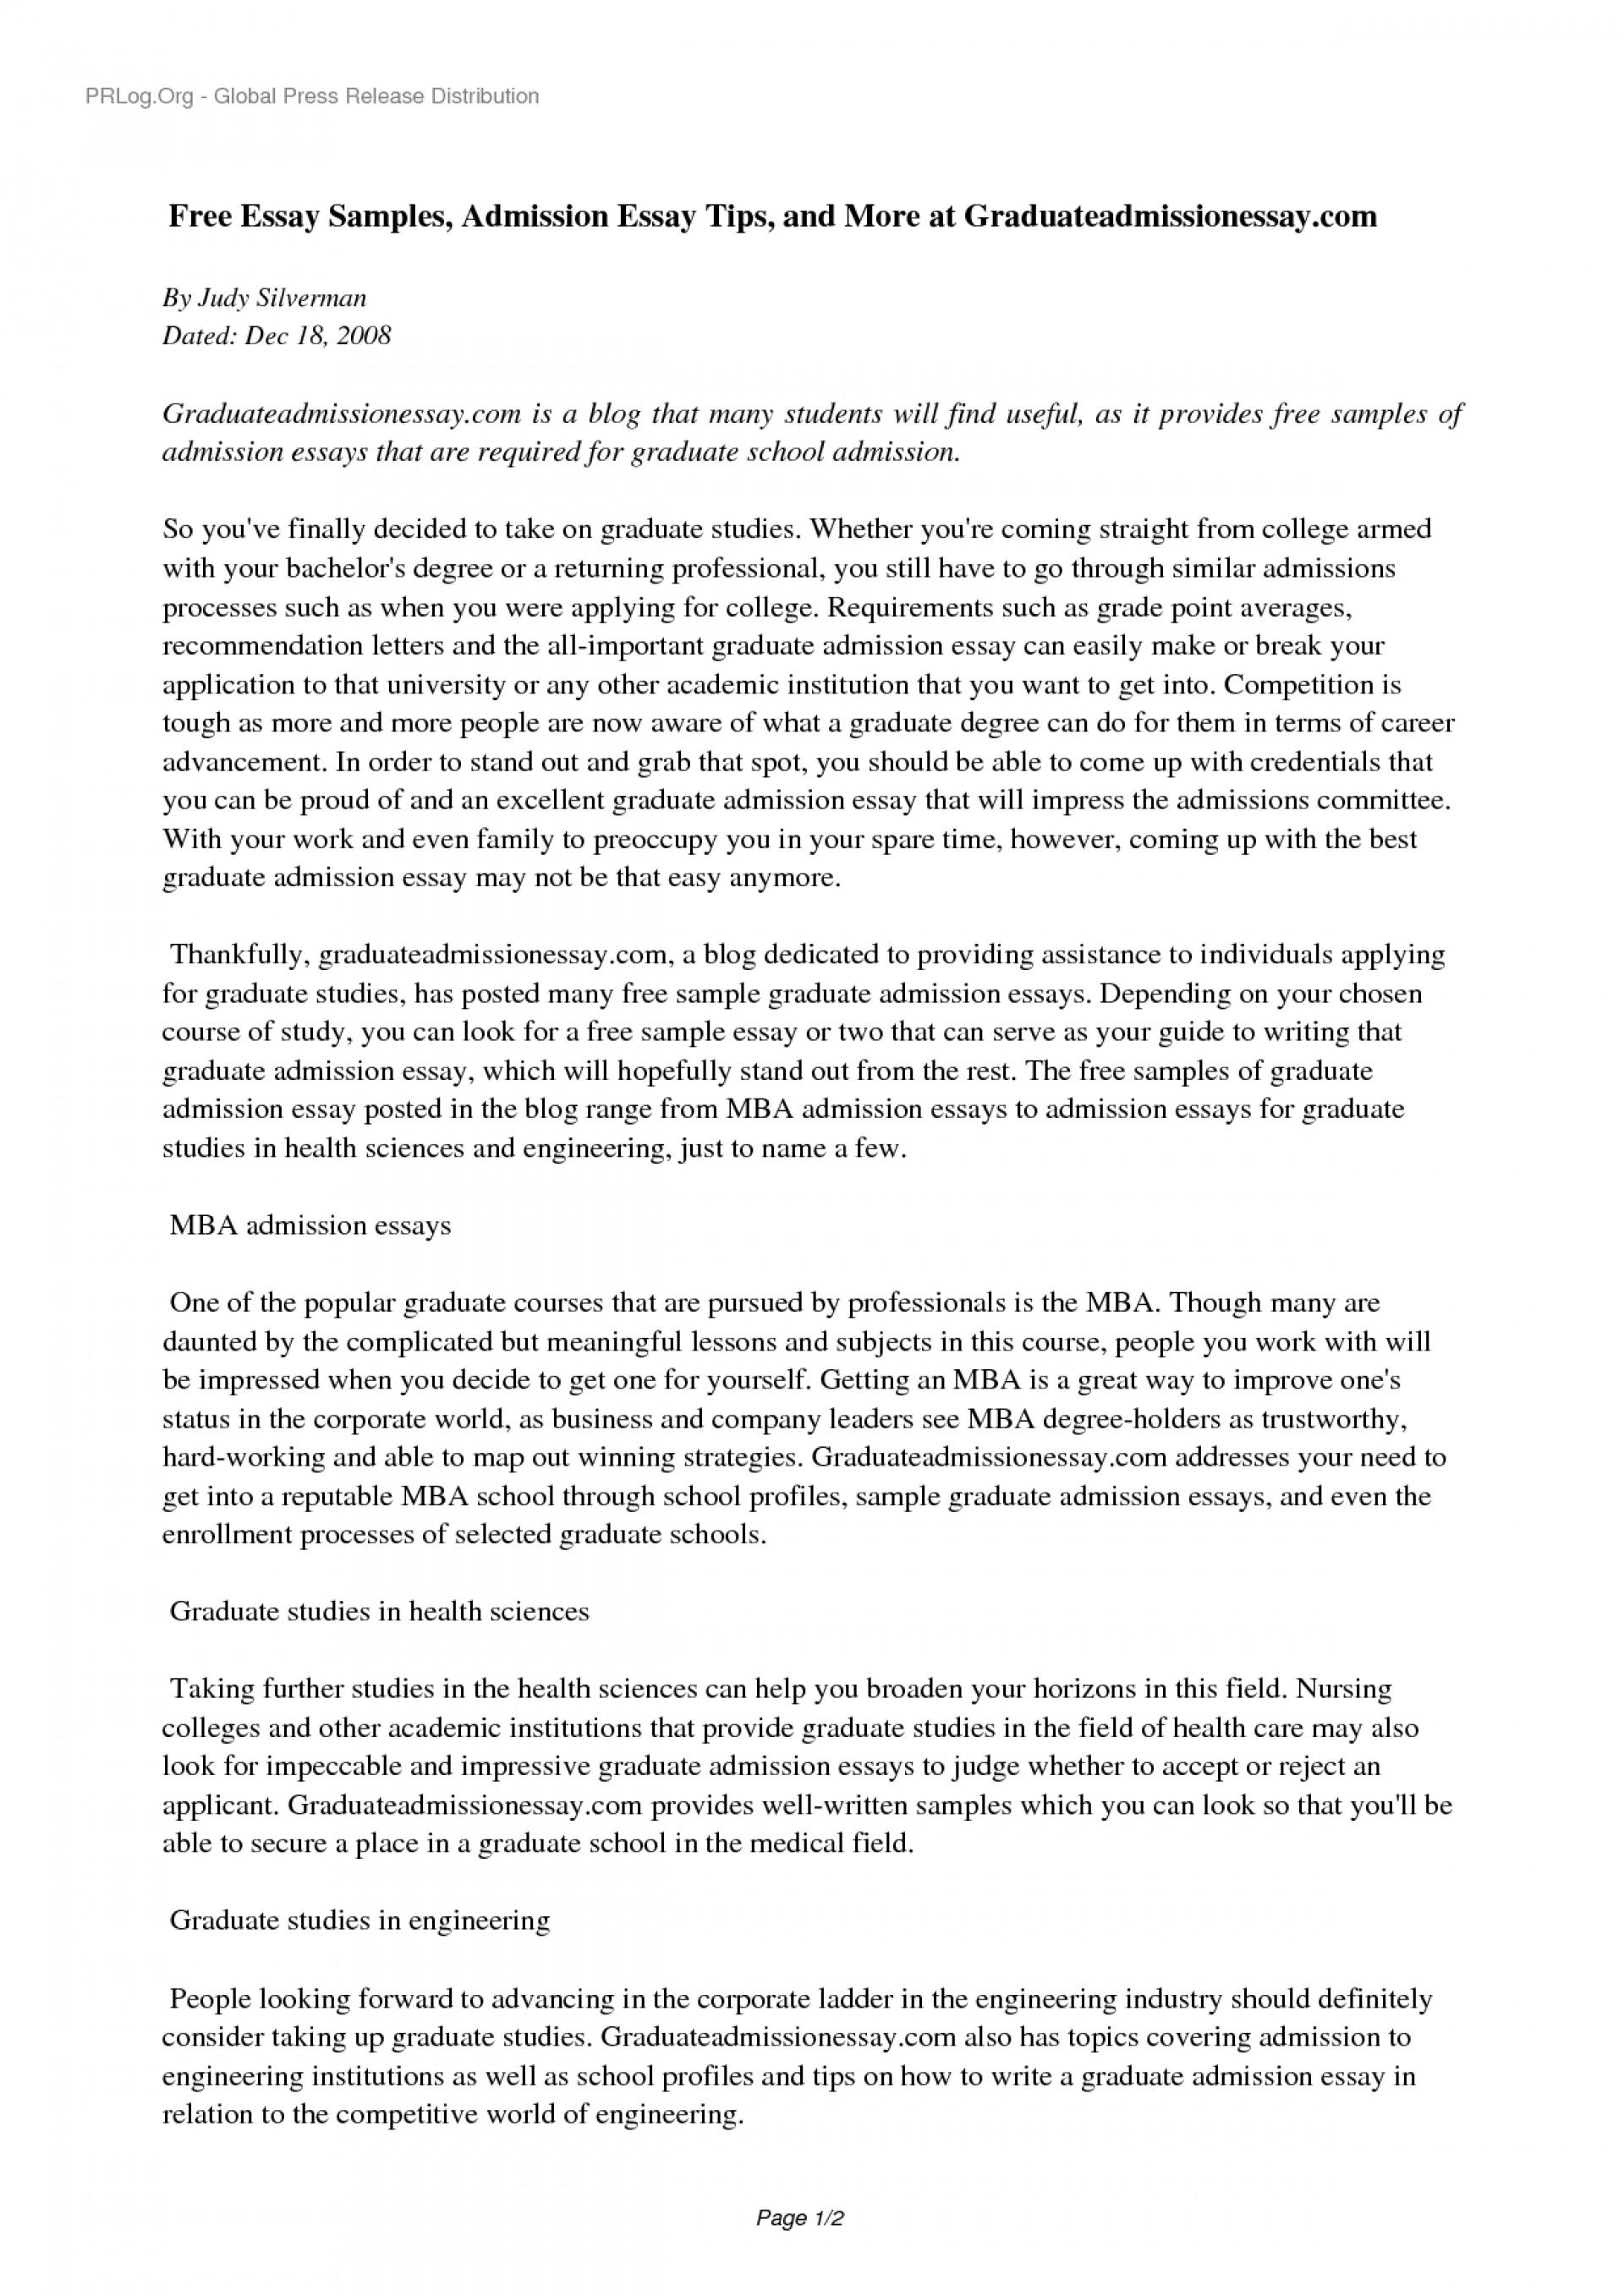 001 Yhn3ns0535 Free Sample Essay For Graduate School Admission Formidable Pdf 1920